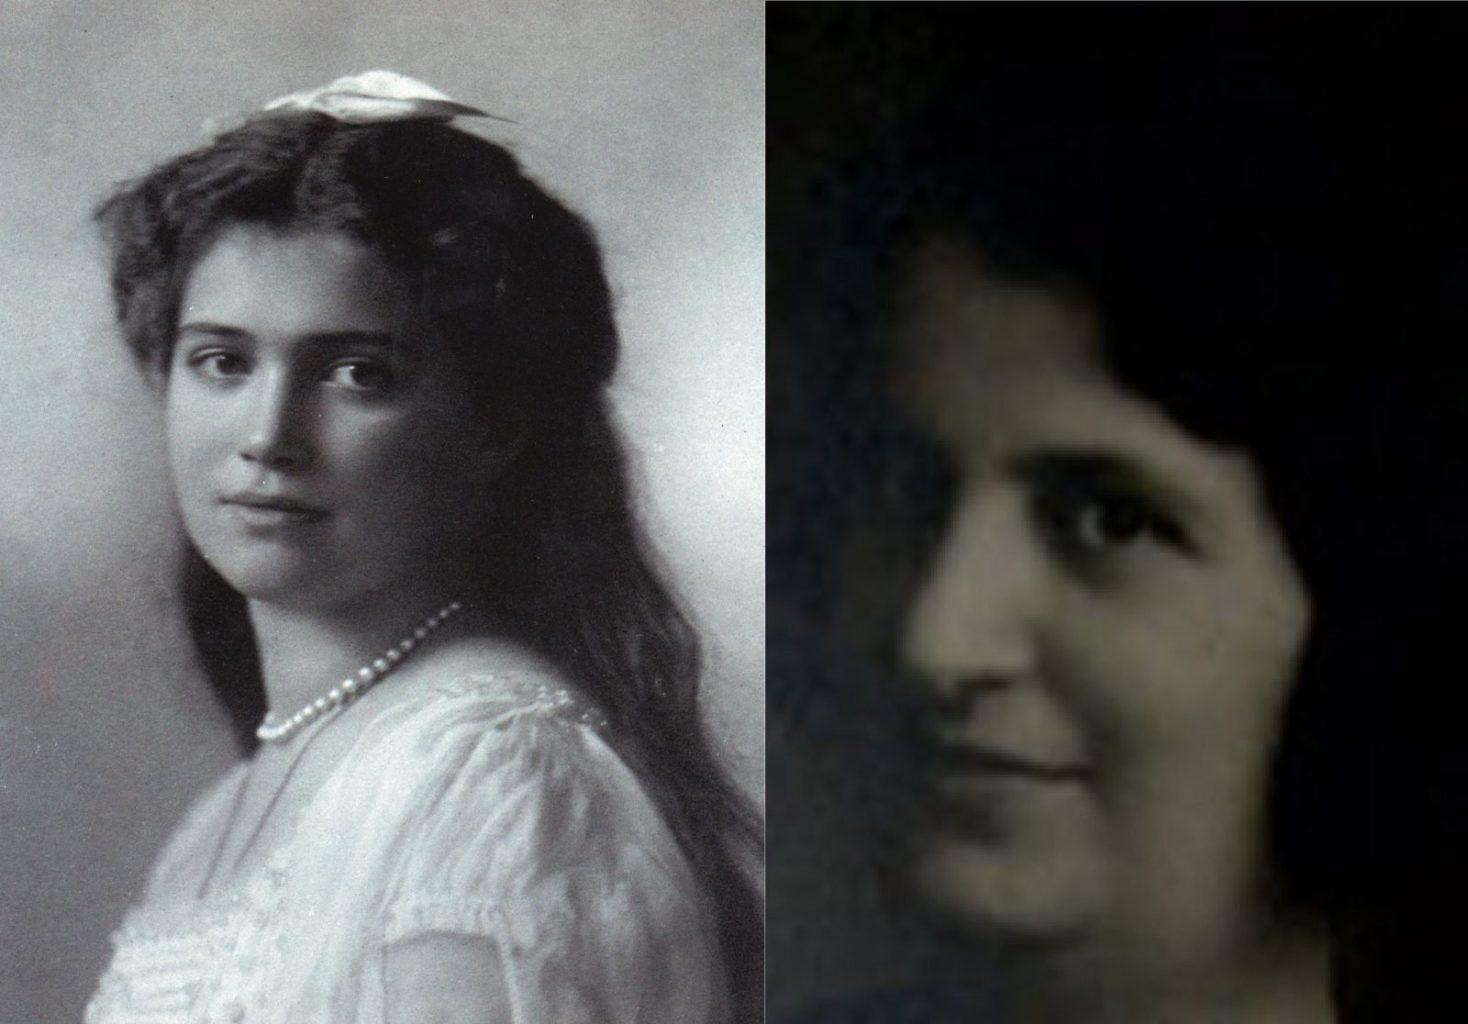 Слева - великая княжна Мария, справа - Аверис Яковелли